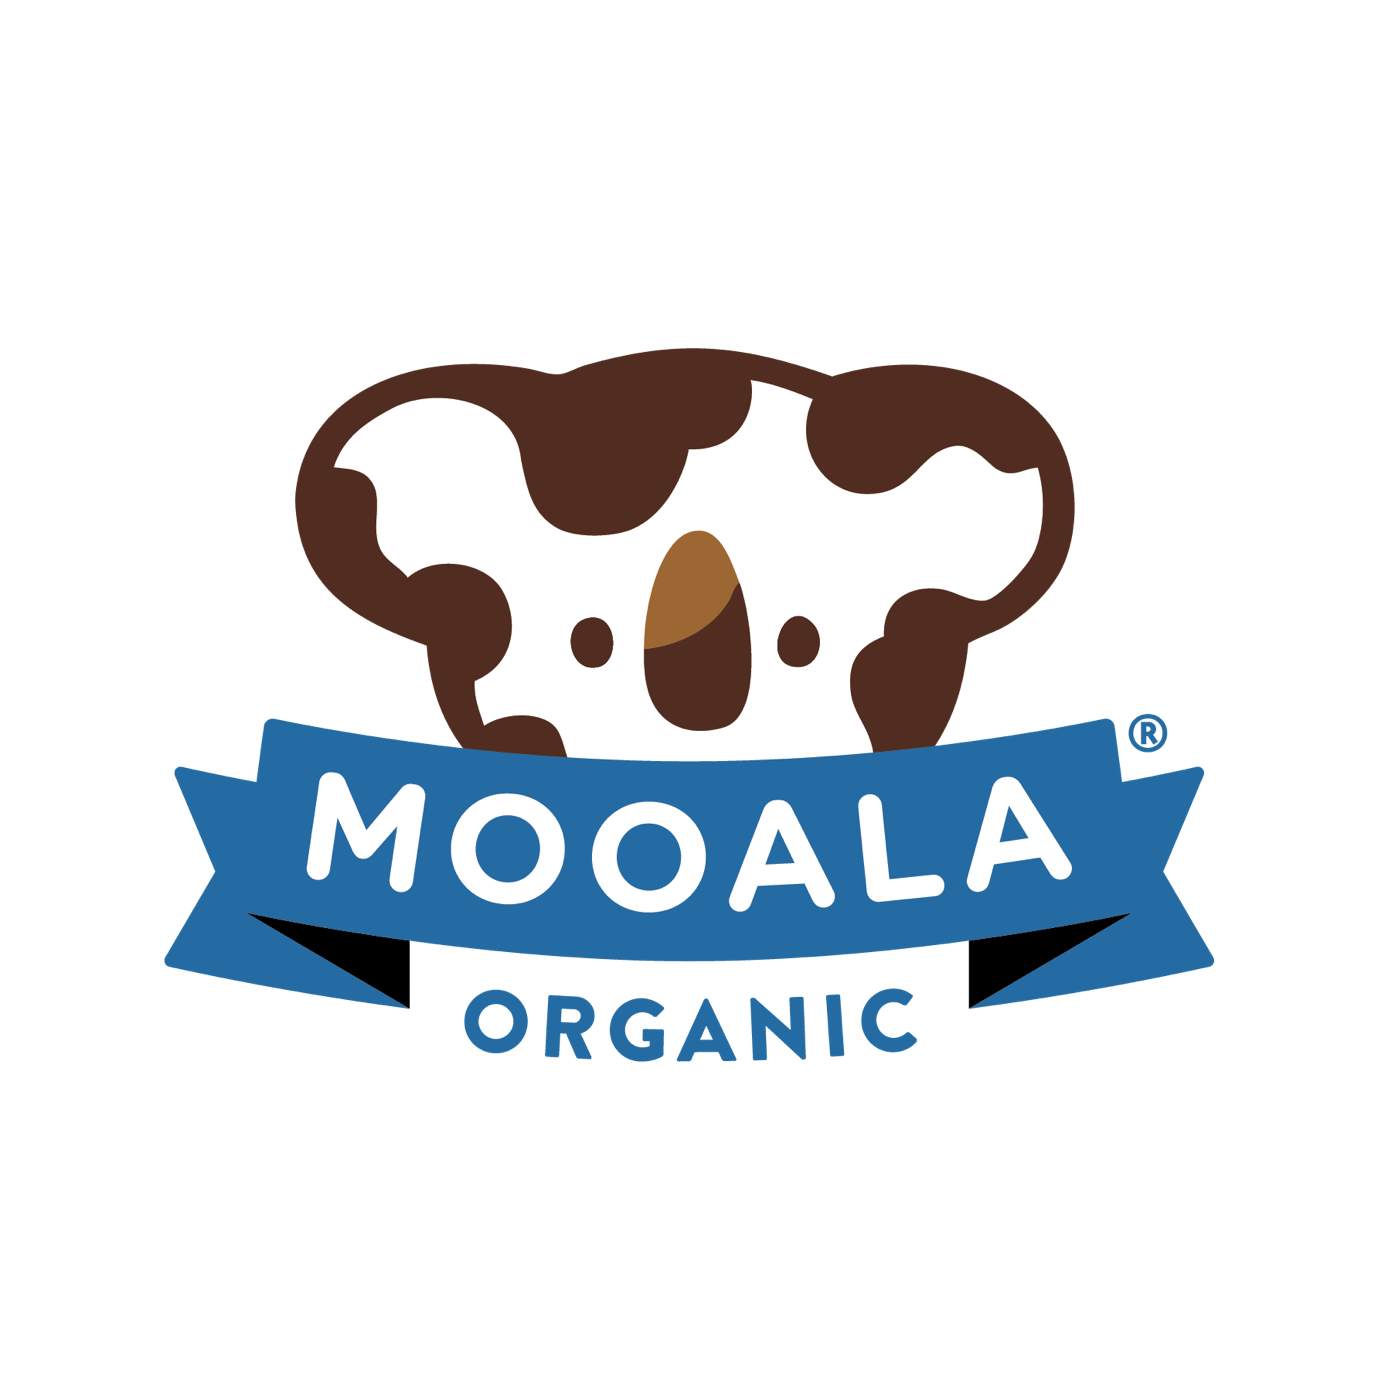 Mooala logo - Keto Certified by the Paleo Foundation